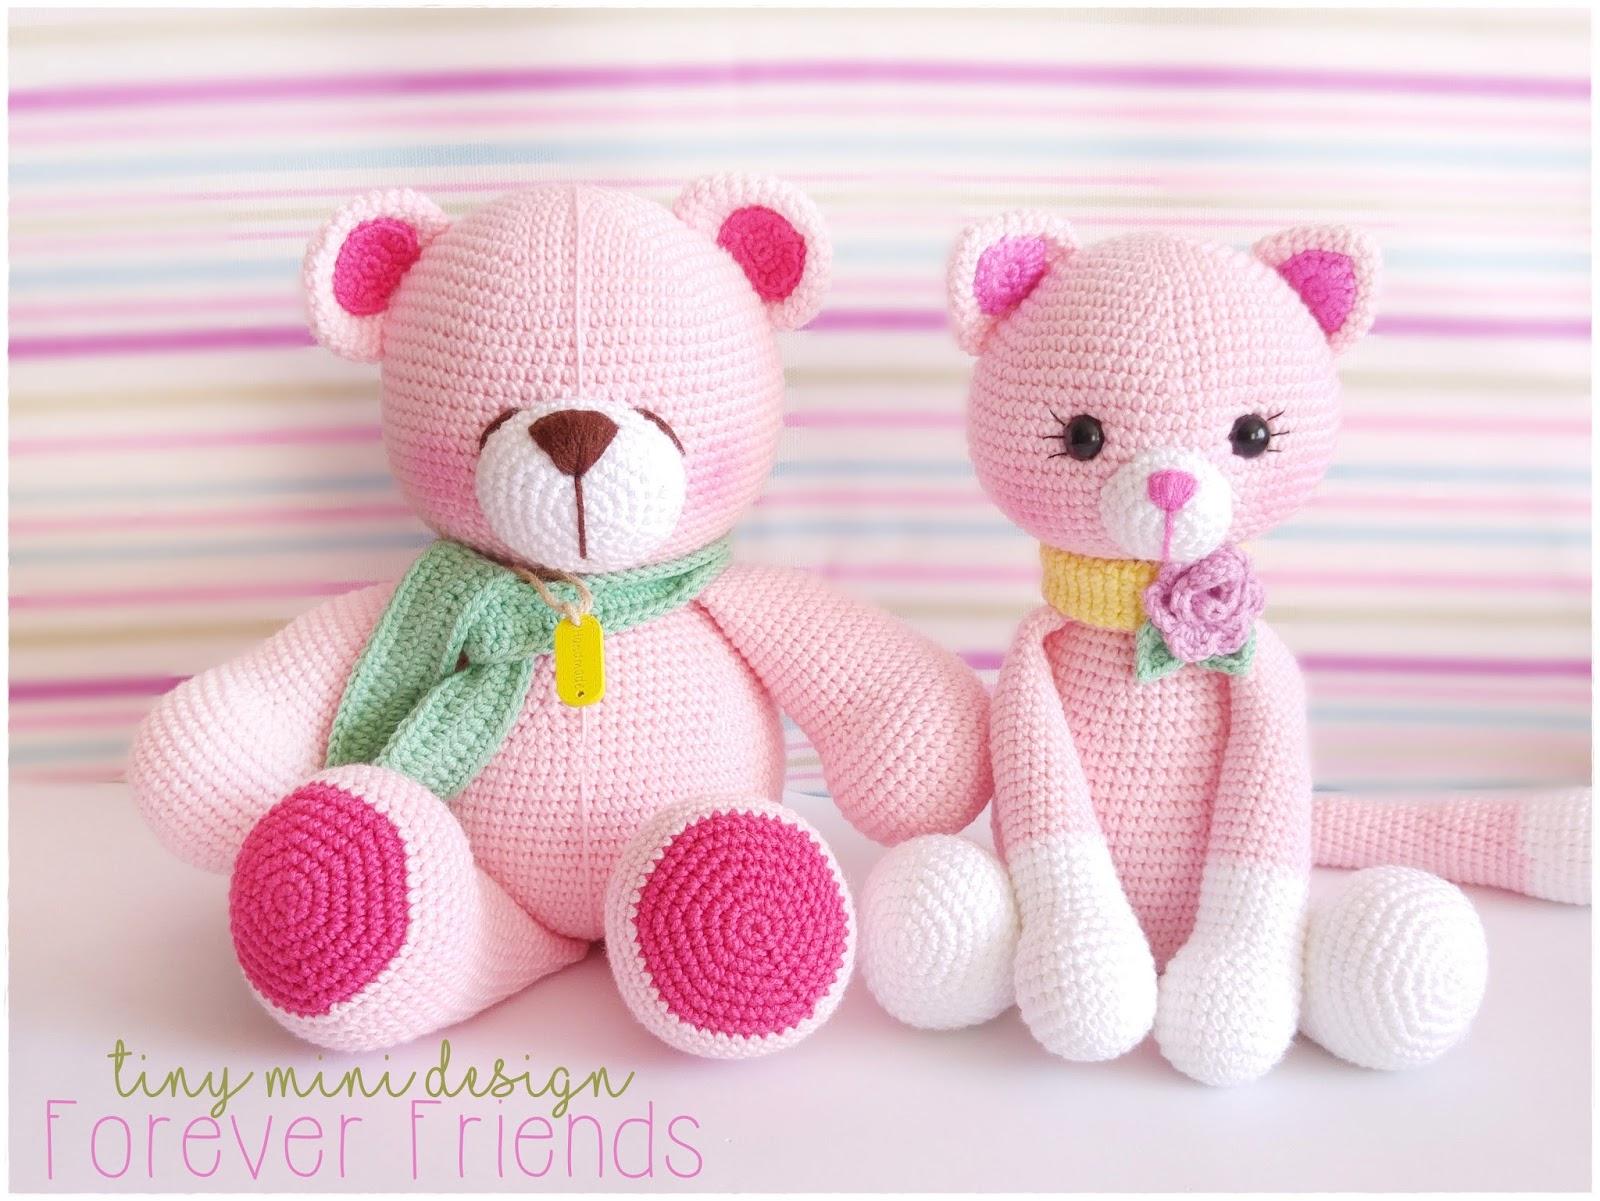 Amigurumi Yapimi Tarifi : Amigurumi Pembe Ayicik-Amigurumi Pink Bear Tiny Mini Design